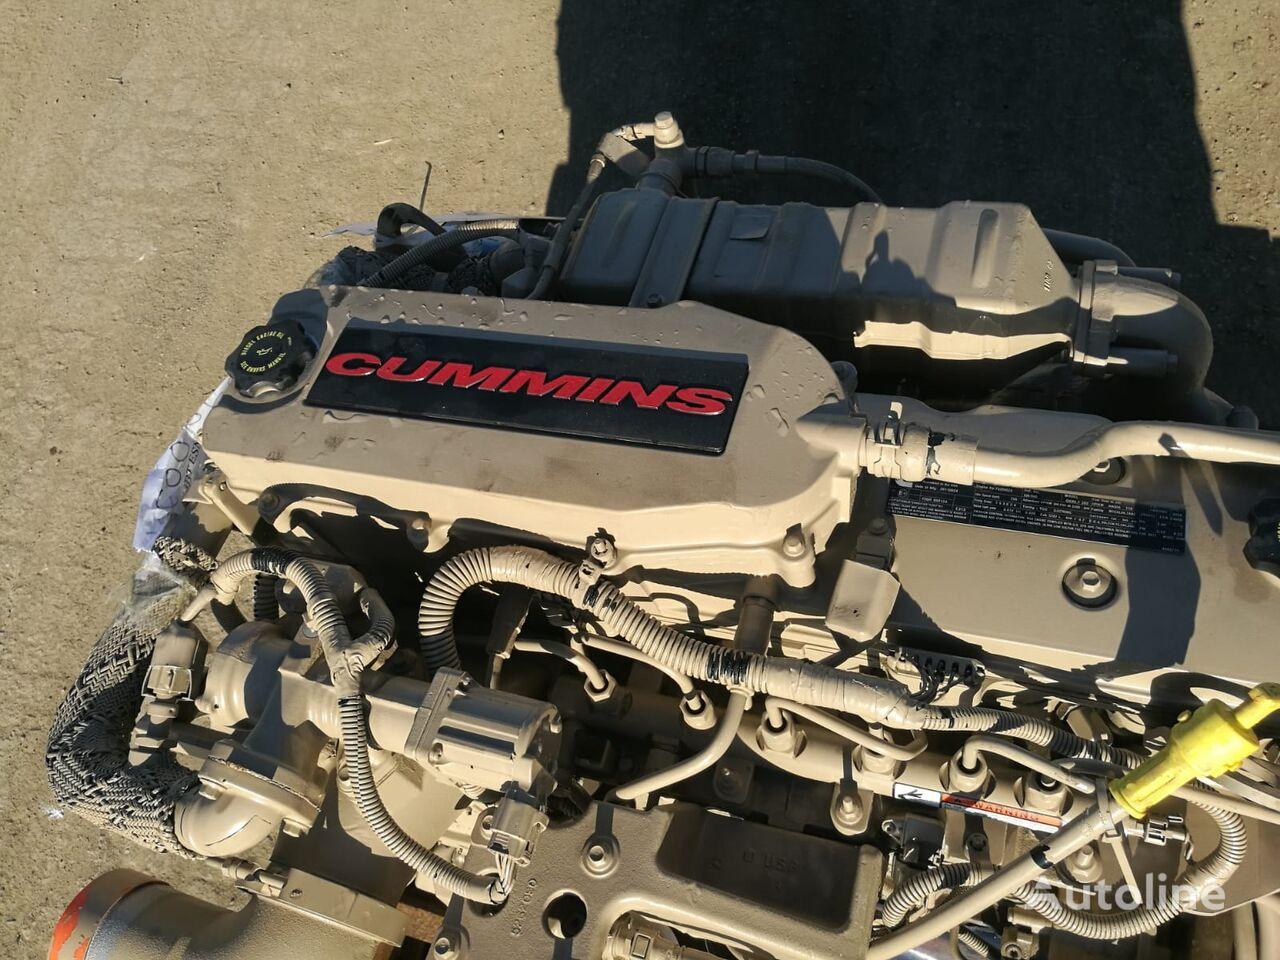 new MOTOR CUMMINS engine for truck